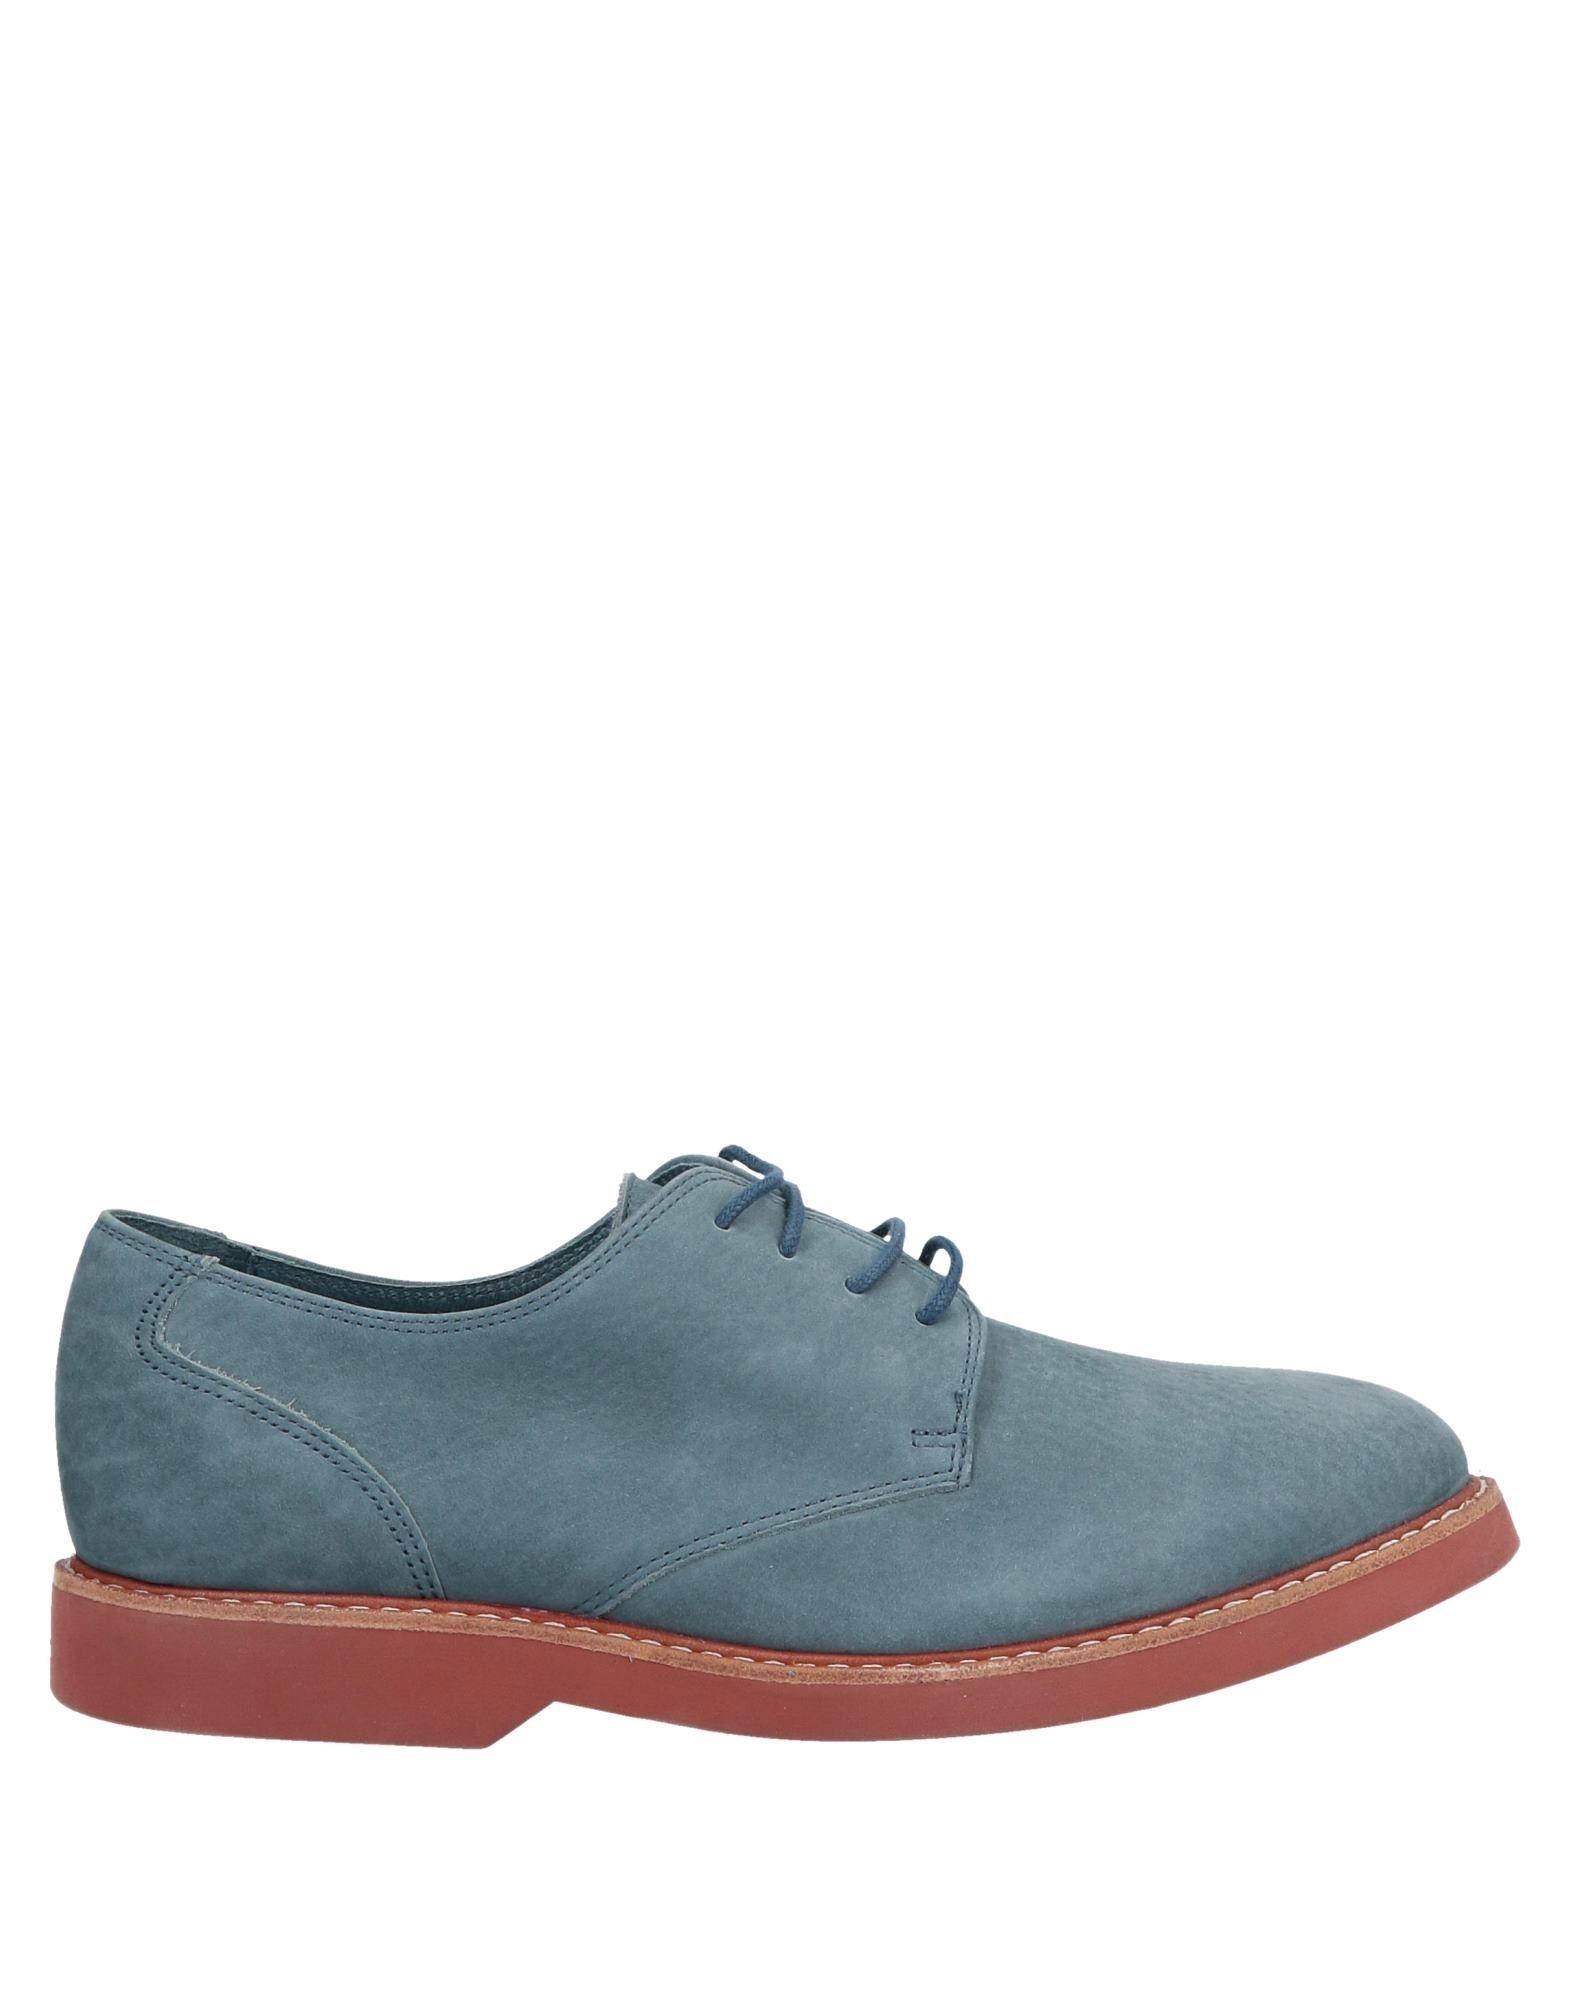 Фото - HACKETT Обувь на шнурках обувь на высокой платформе dkny